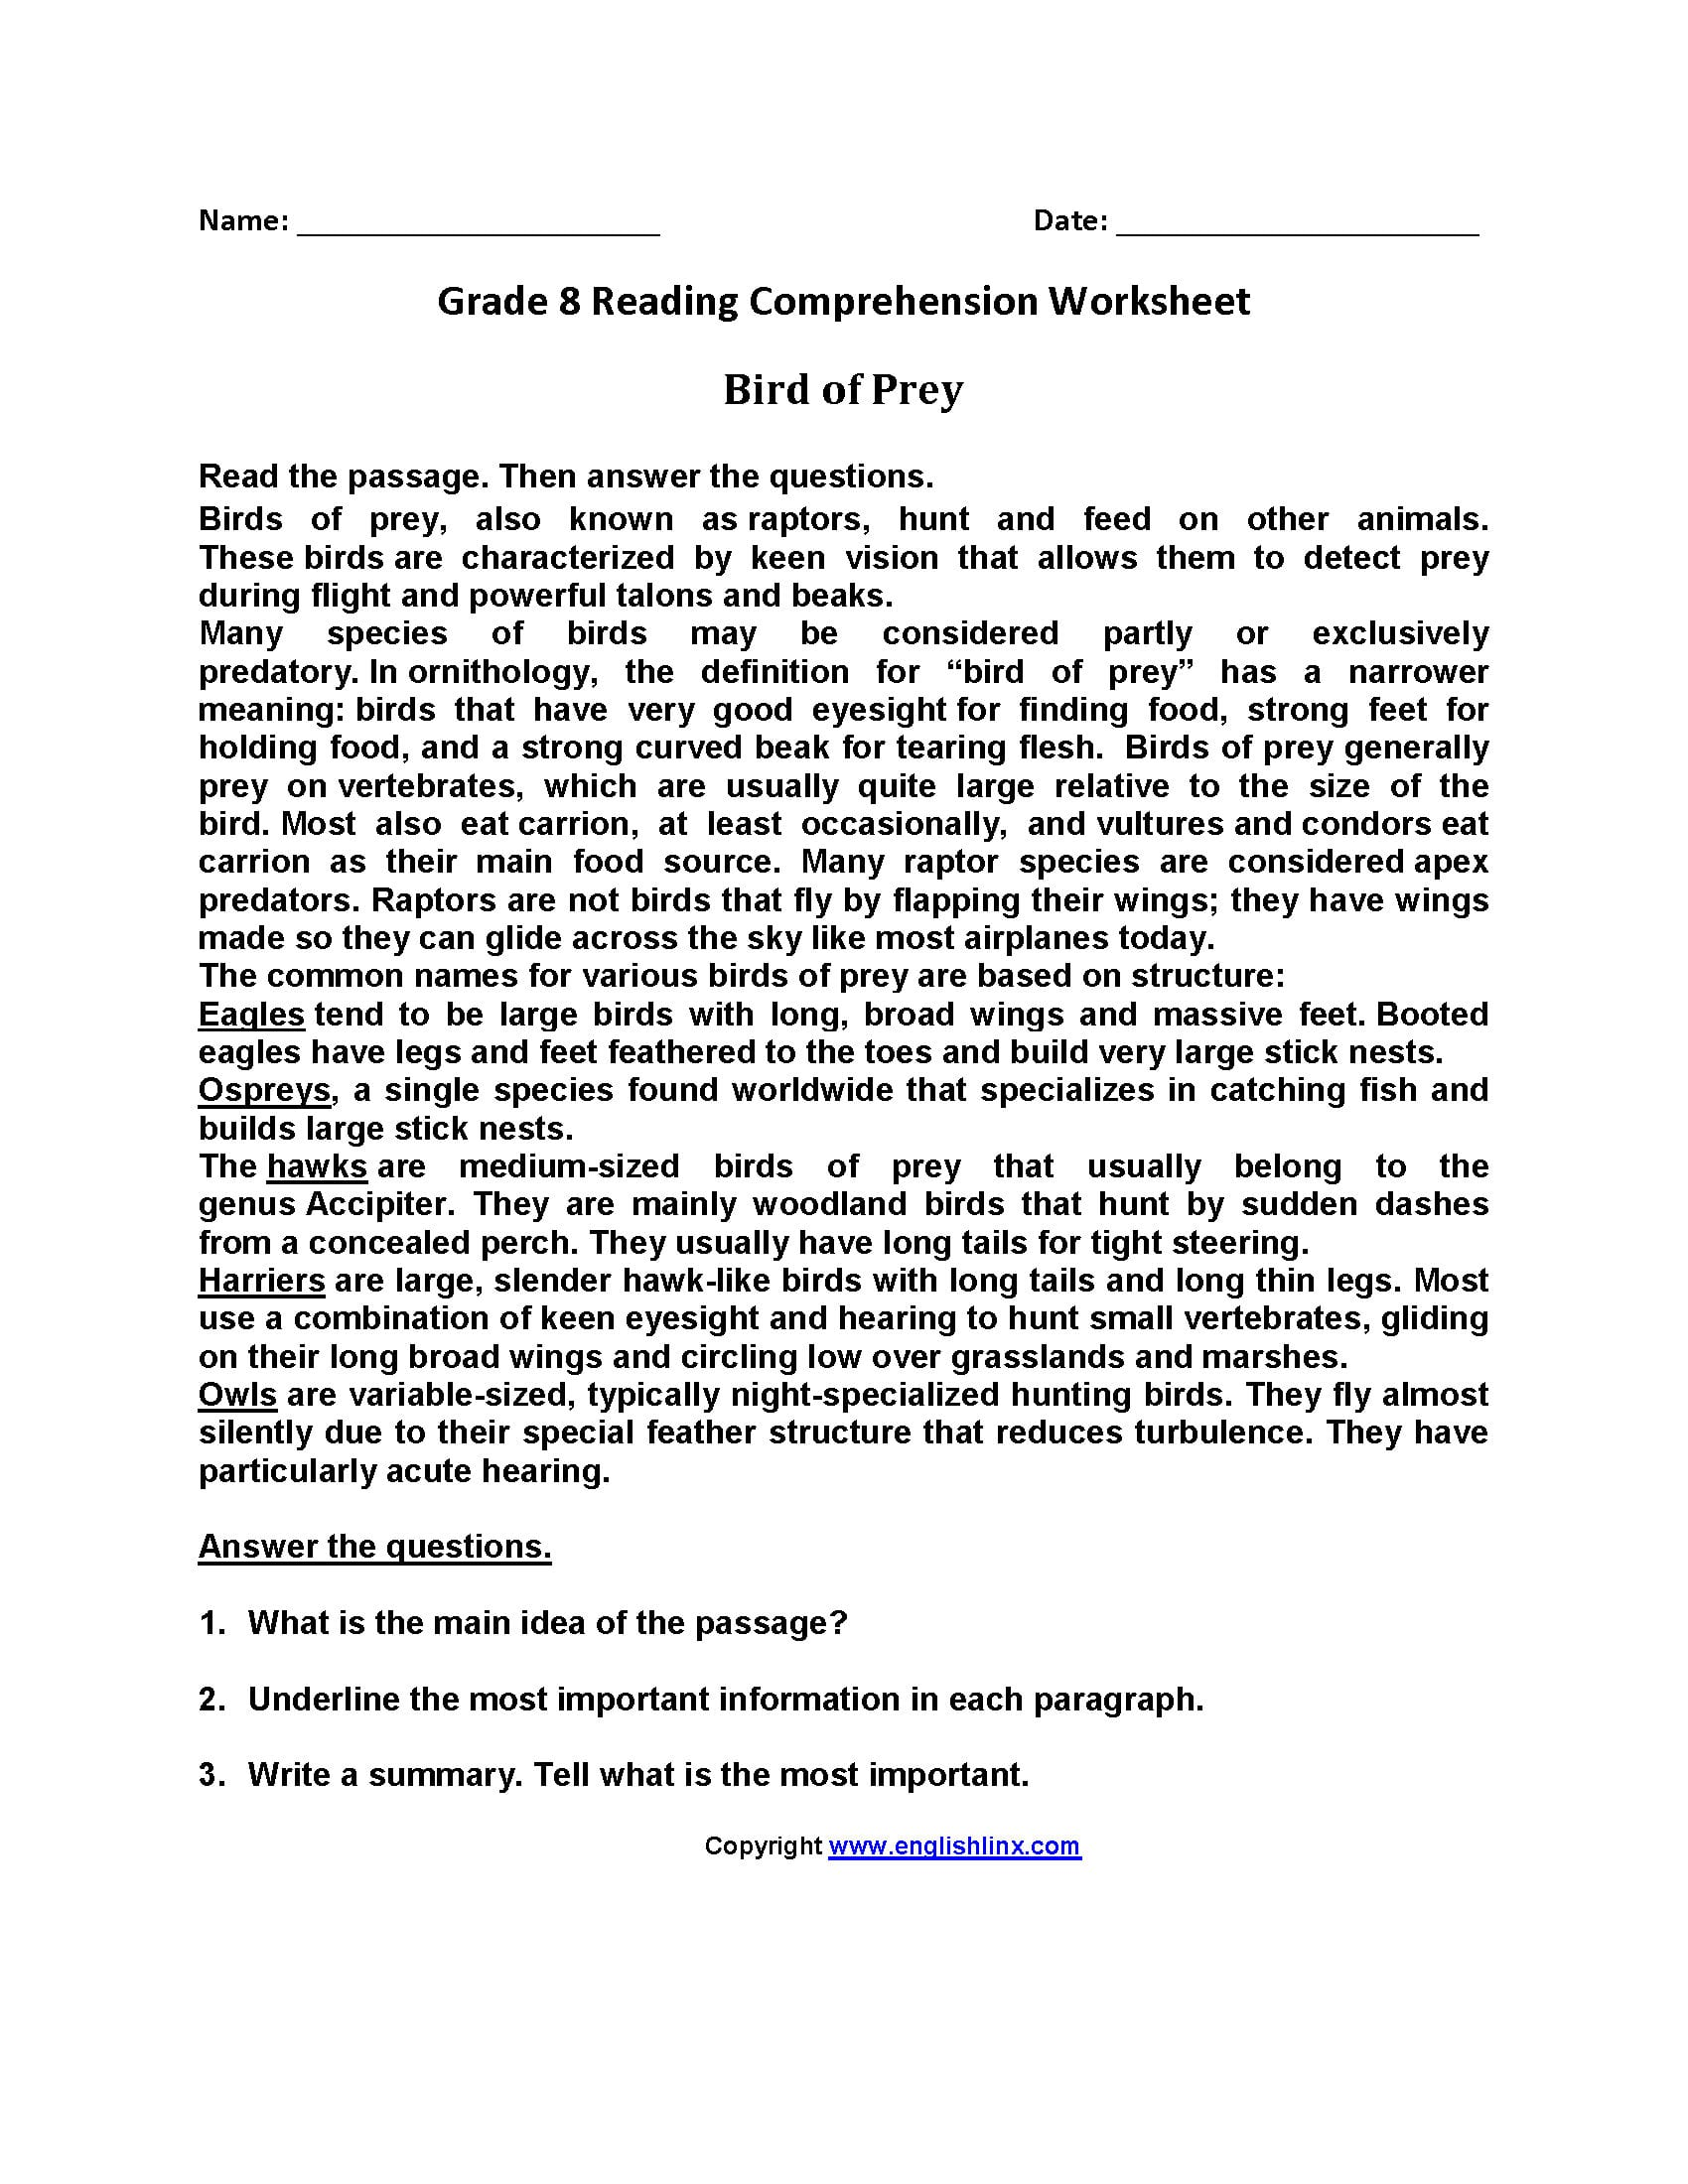 8Th Grade Reading Comprehension Worksheets — db excel.com